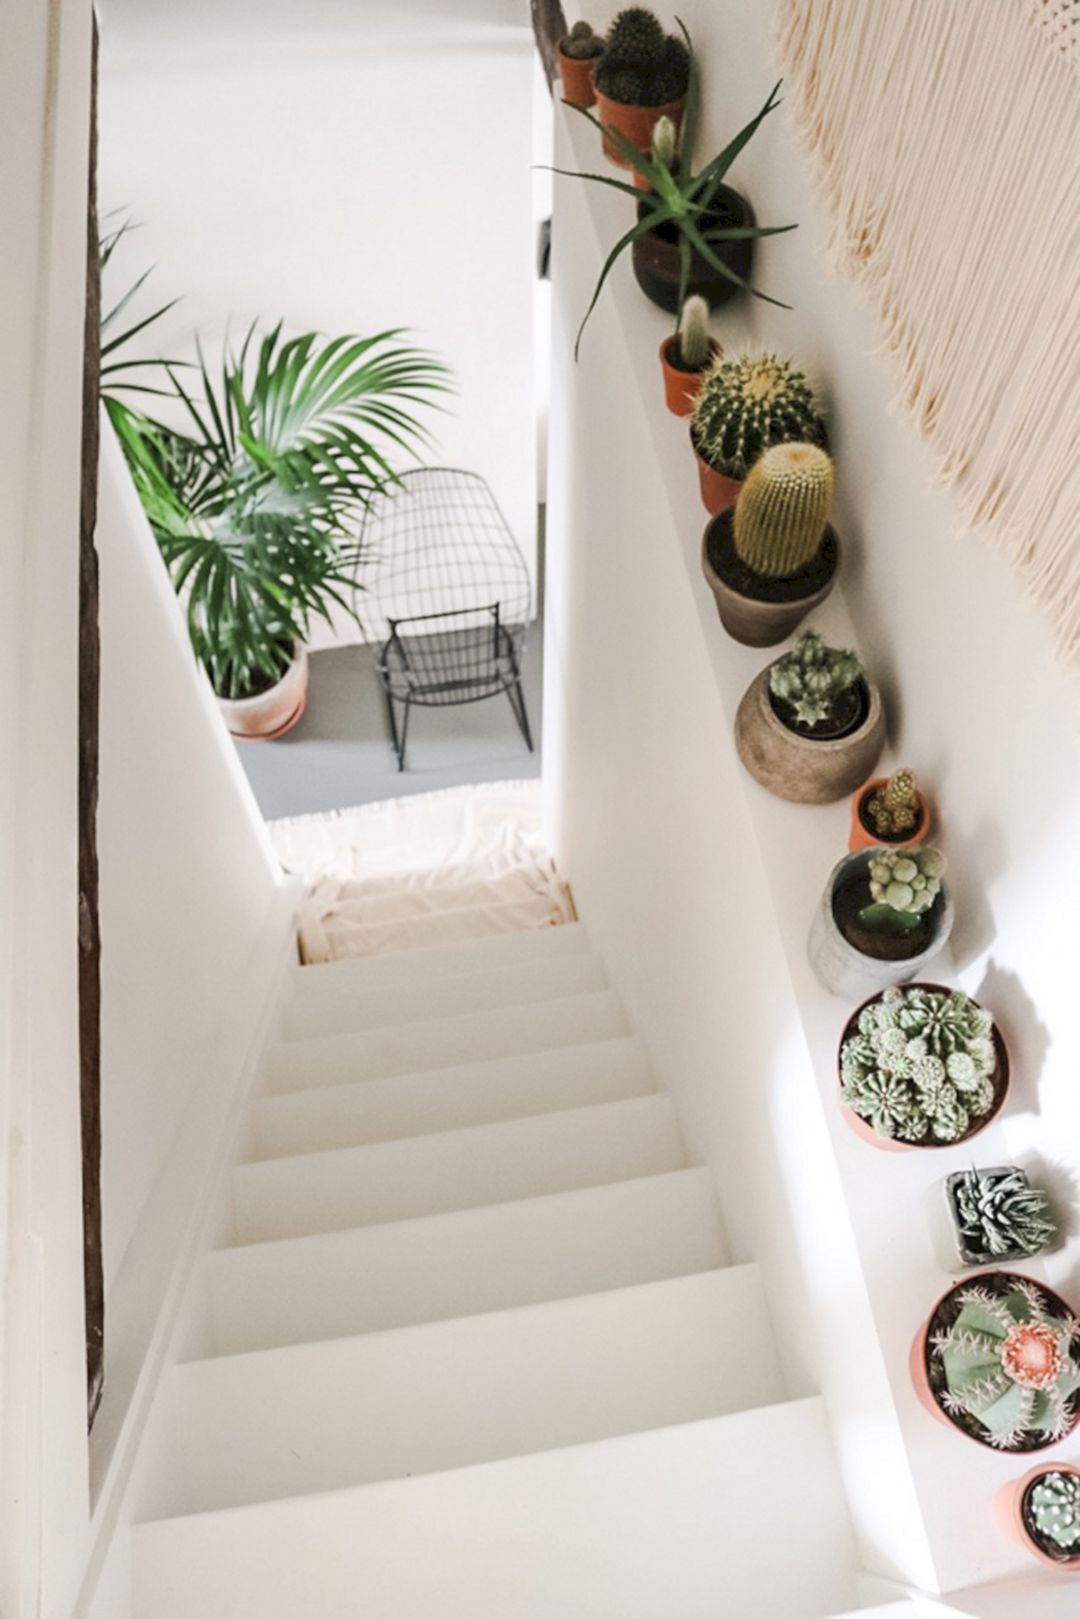 18 fabulous basement apartment ideas you have to know new house rh pinterest com